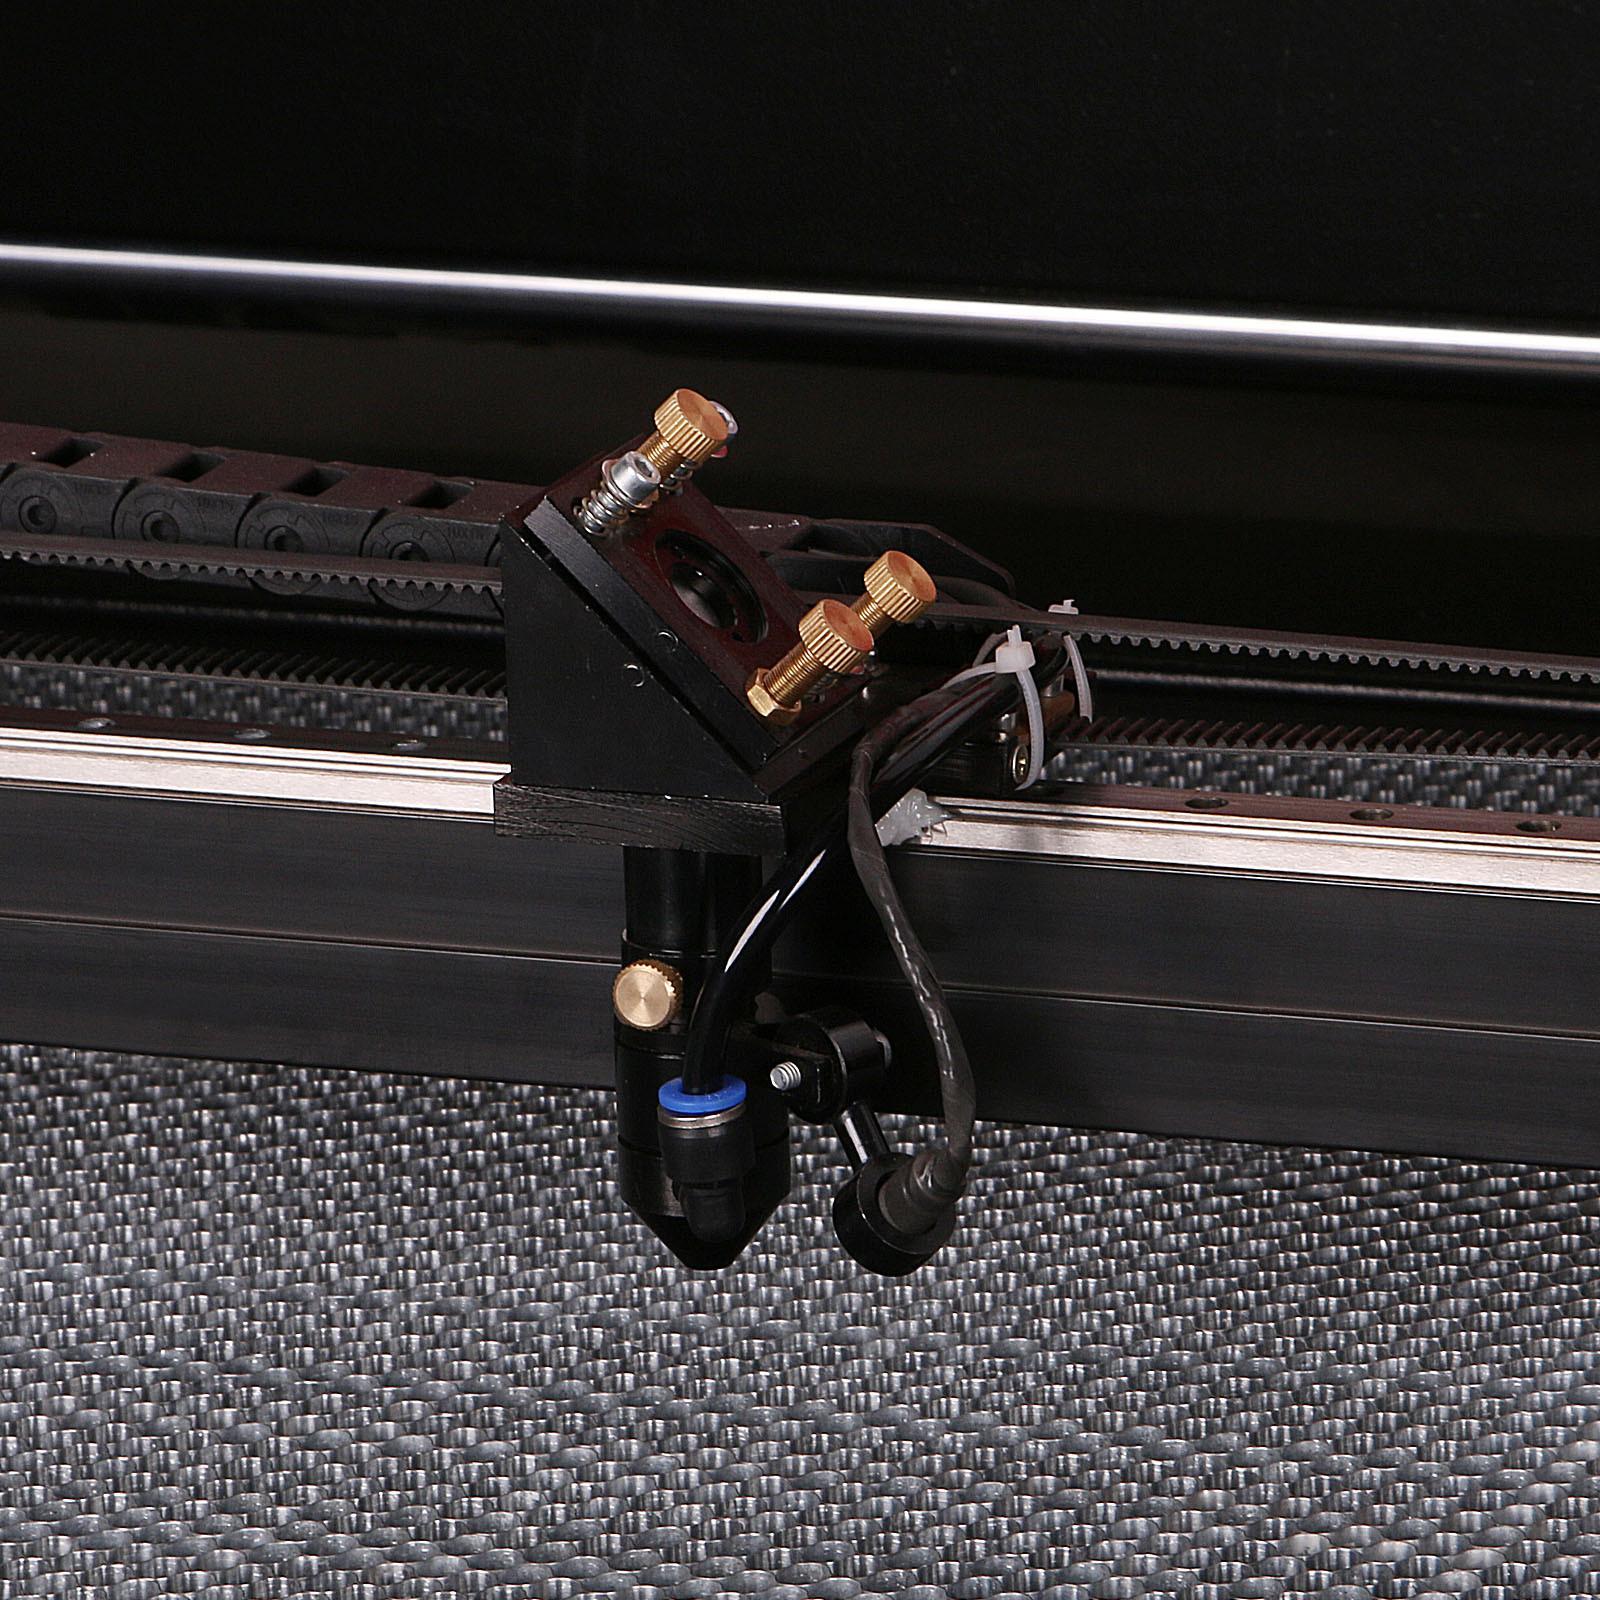 Macchina-per-Incisione-Laser-CO2-40-130W-Asse-Rotante-Tagliatrice-Incisore miniatura 67